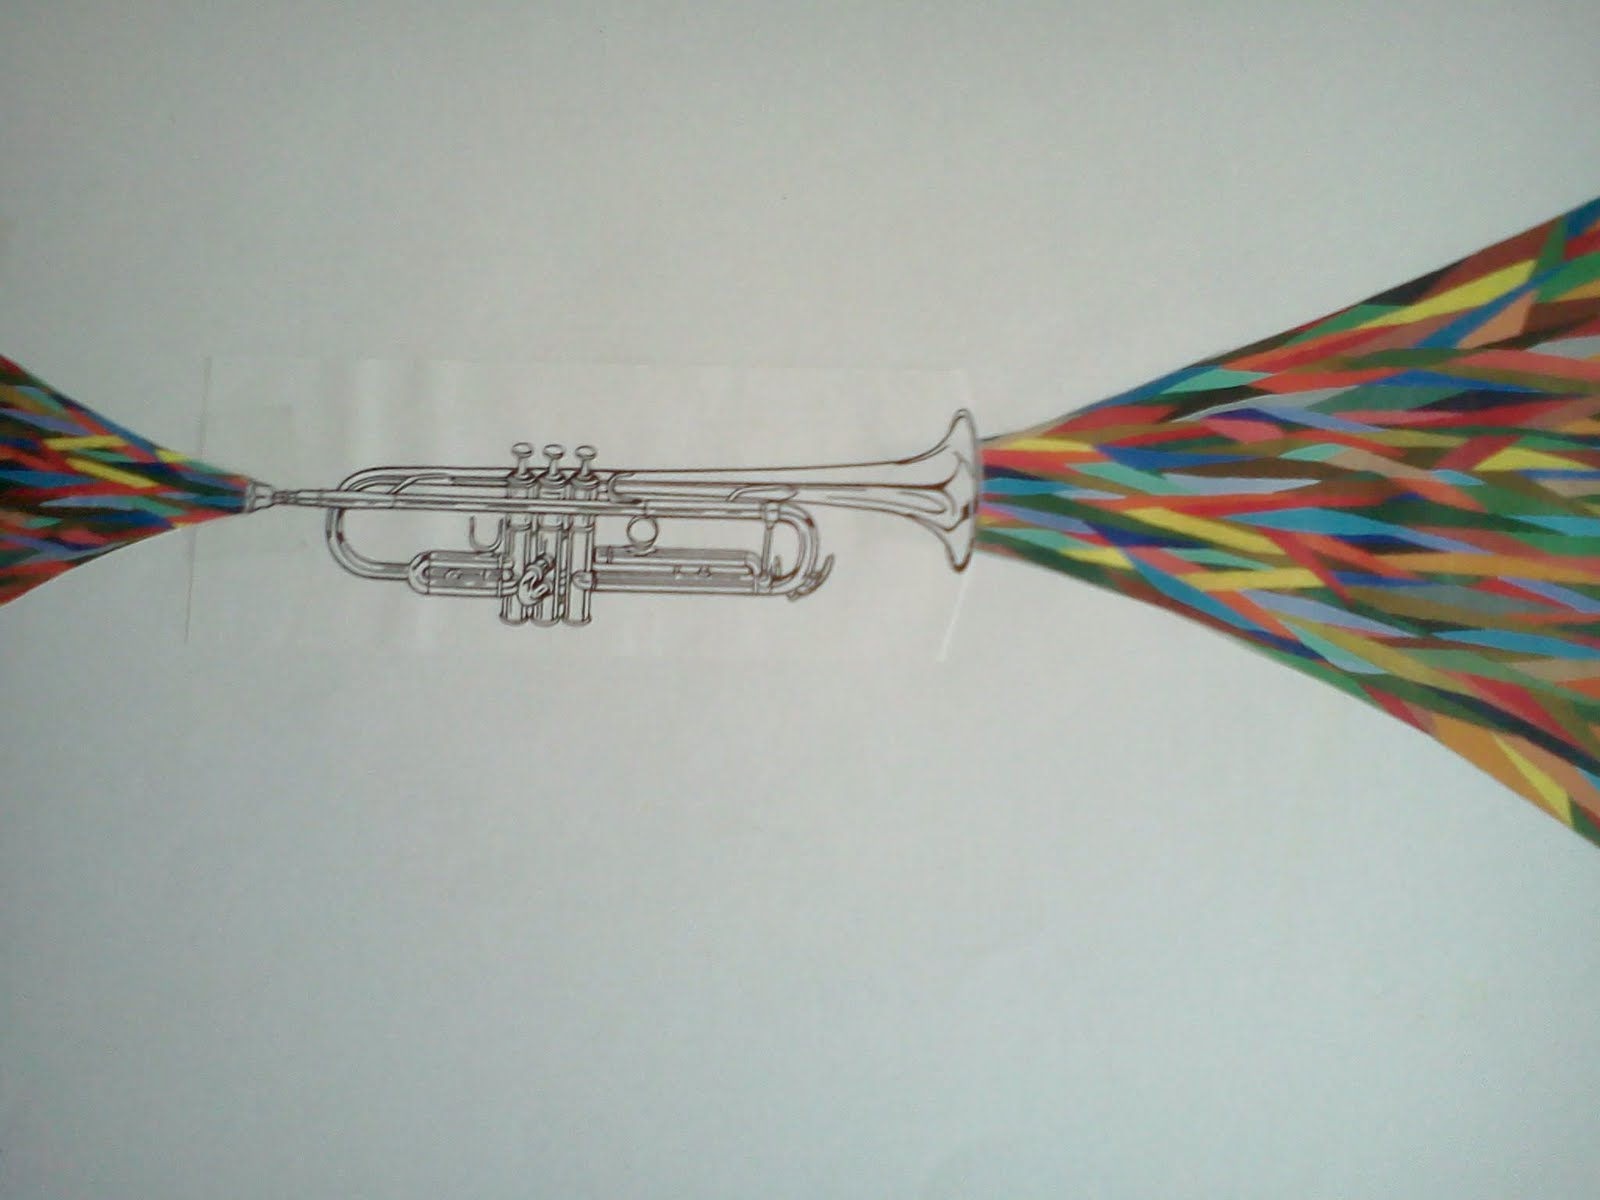 http://1.bp.blogspot.com/-0rVaYkDpHNM/TlwKGoQIVDI/AAAAAAAAA3s/smQ3GxV-afc/s1600/trumpet%2Bcolor%2Bin.jpg